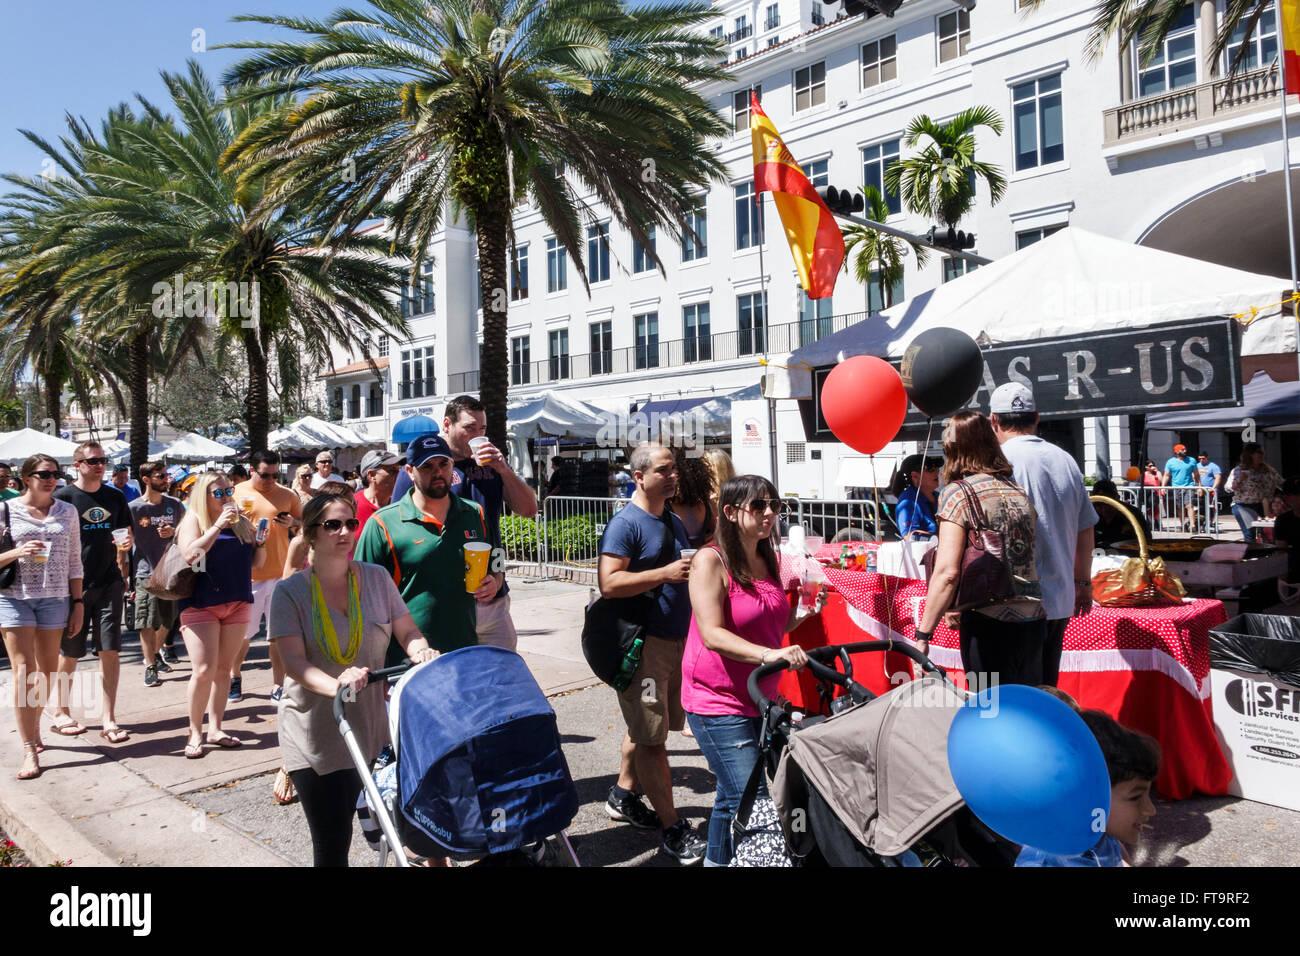 Florida FL Miami Coral Gables Carnaval Carnival Miracle Mile street festival annual celebration Hispanic man woman - Stock Image